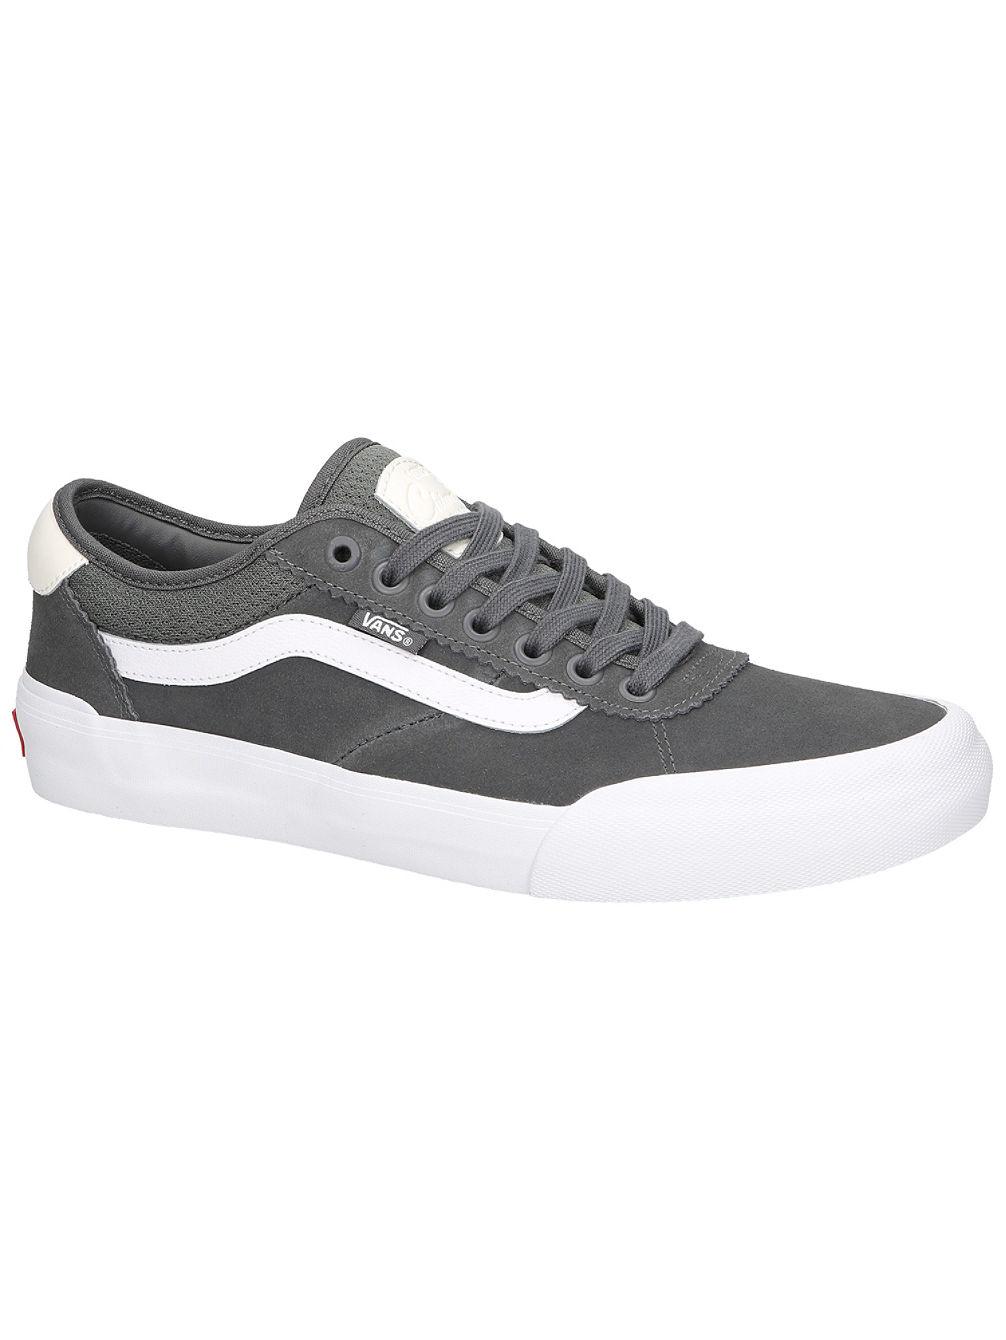 Buy Vans Chima Pro 2 Skate Shoes online at blue-tomato.com 338ce8d1f